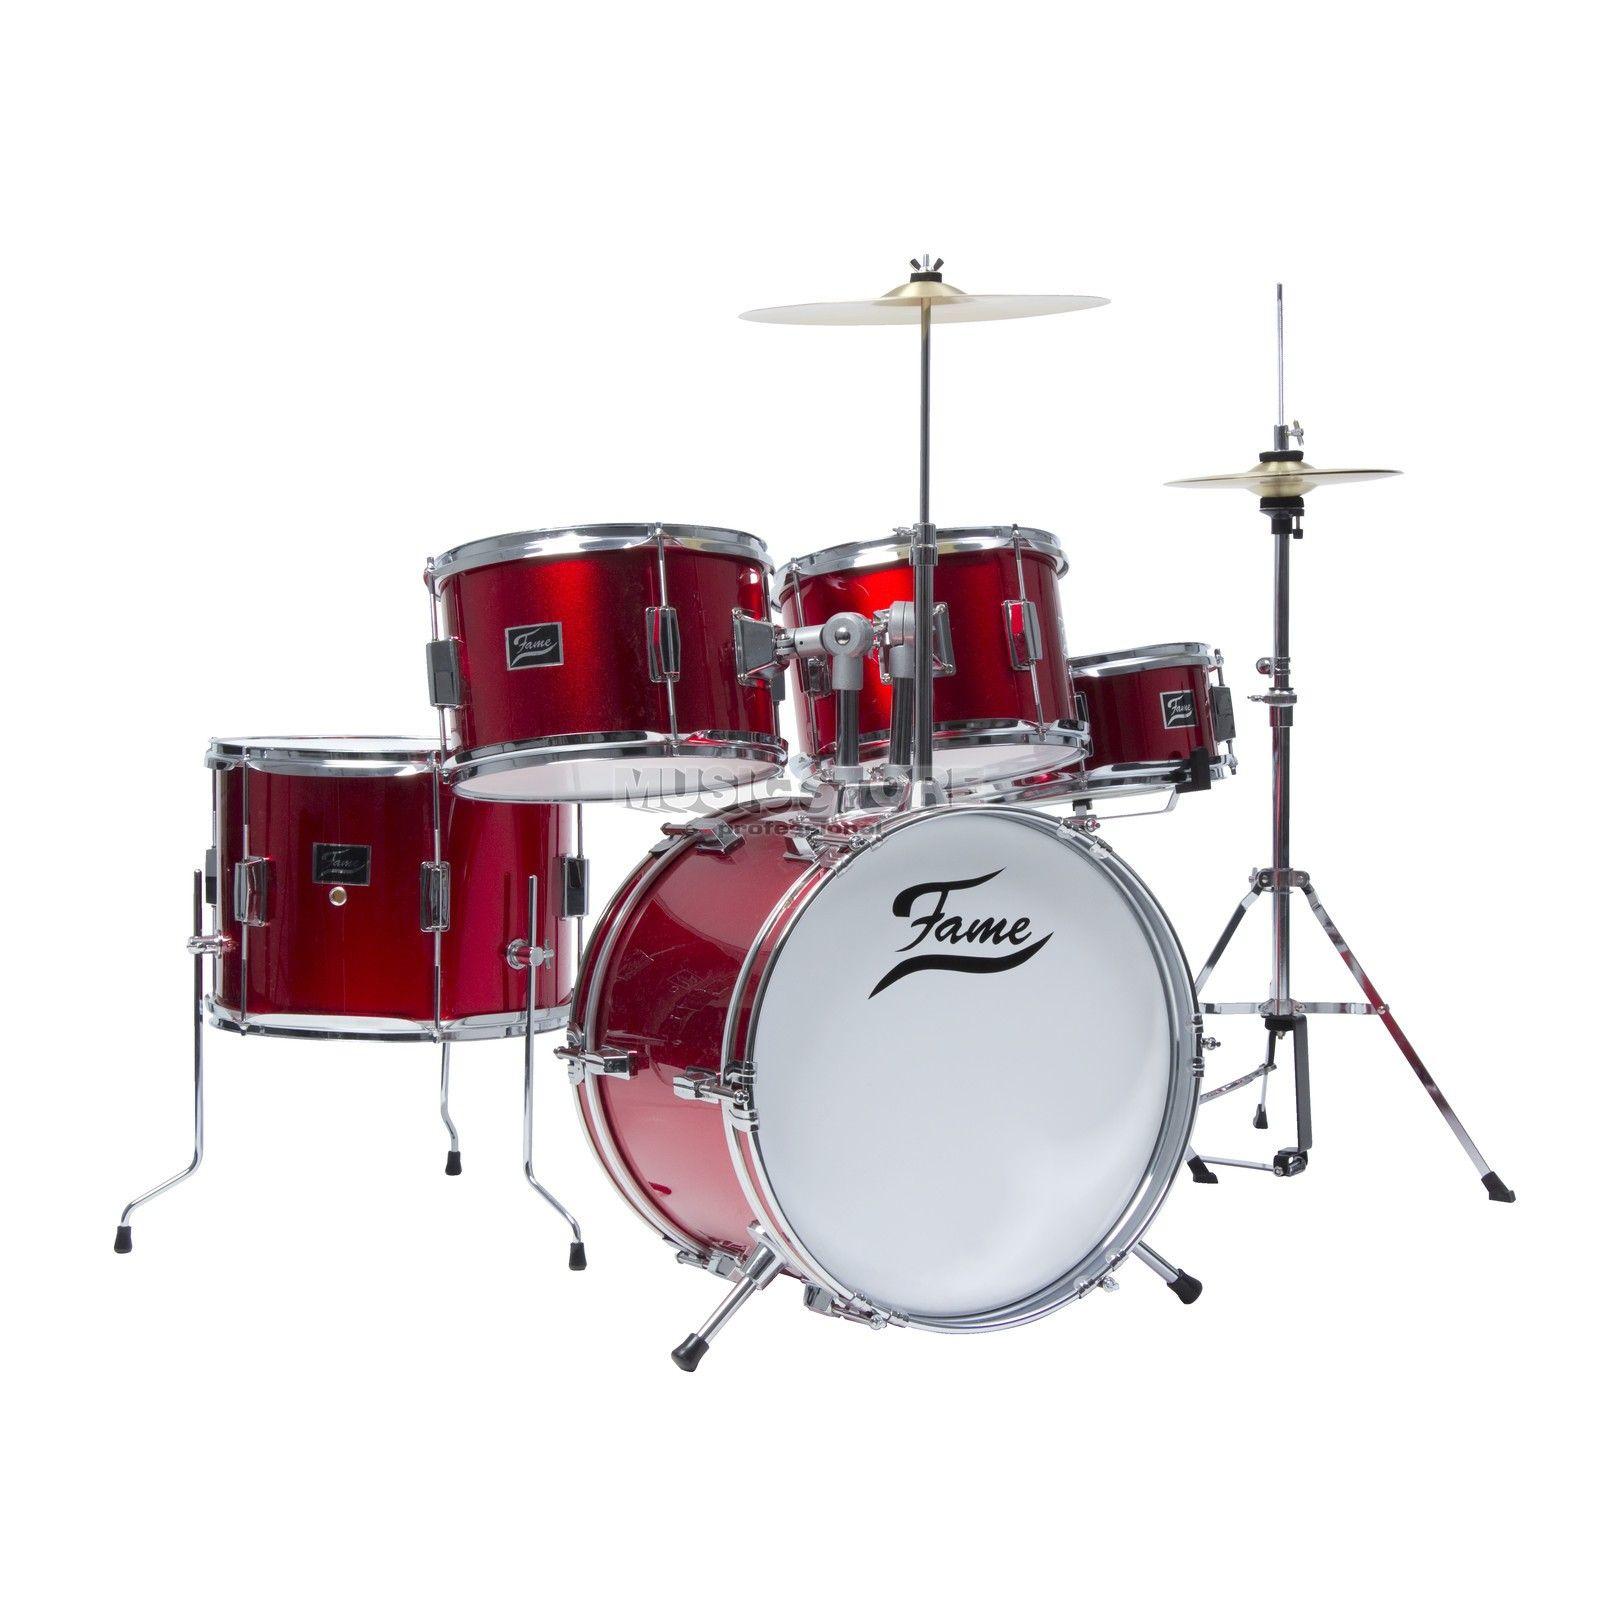 Fame Kiddyset 5 Pc Junior Drumset 799zl Perkusja Instrumenty